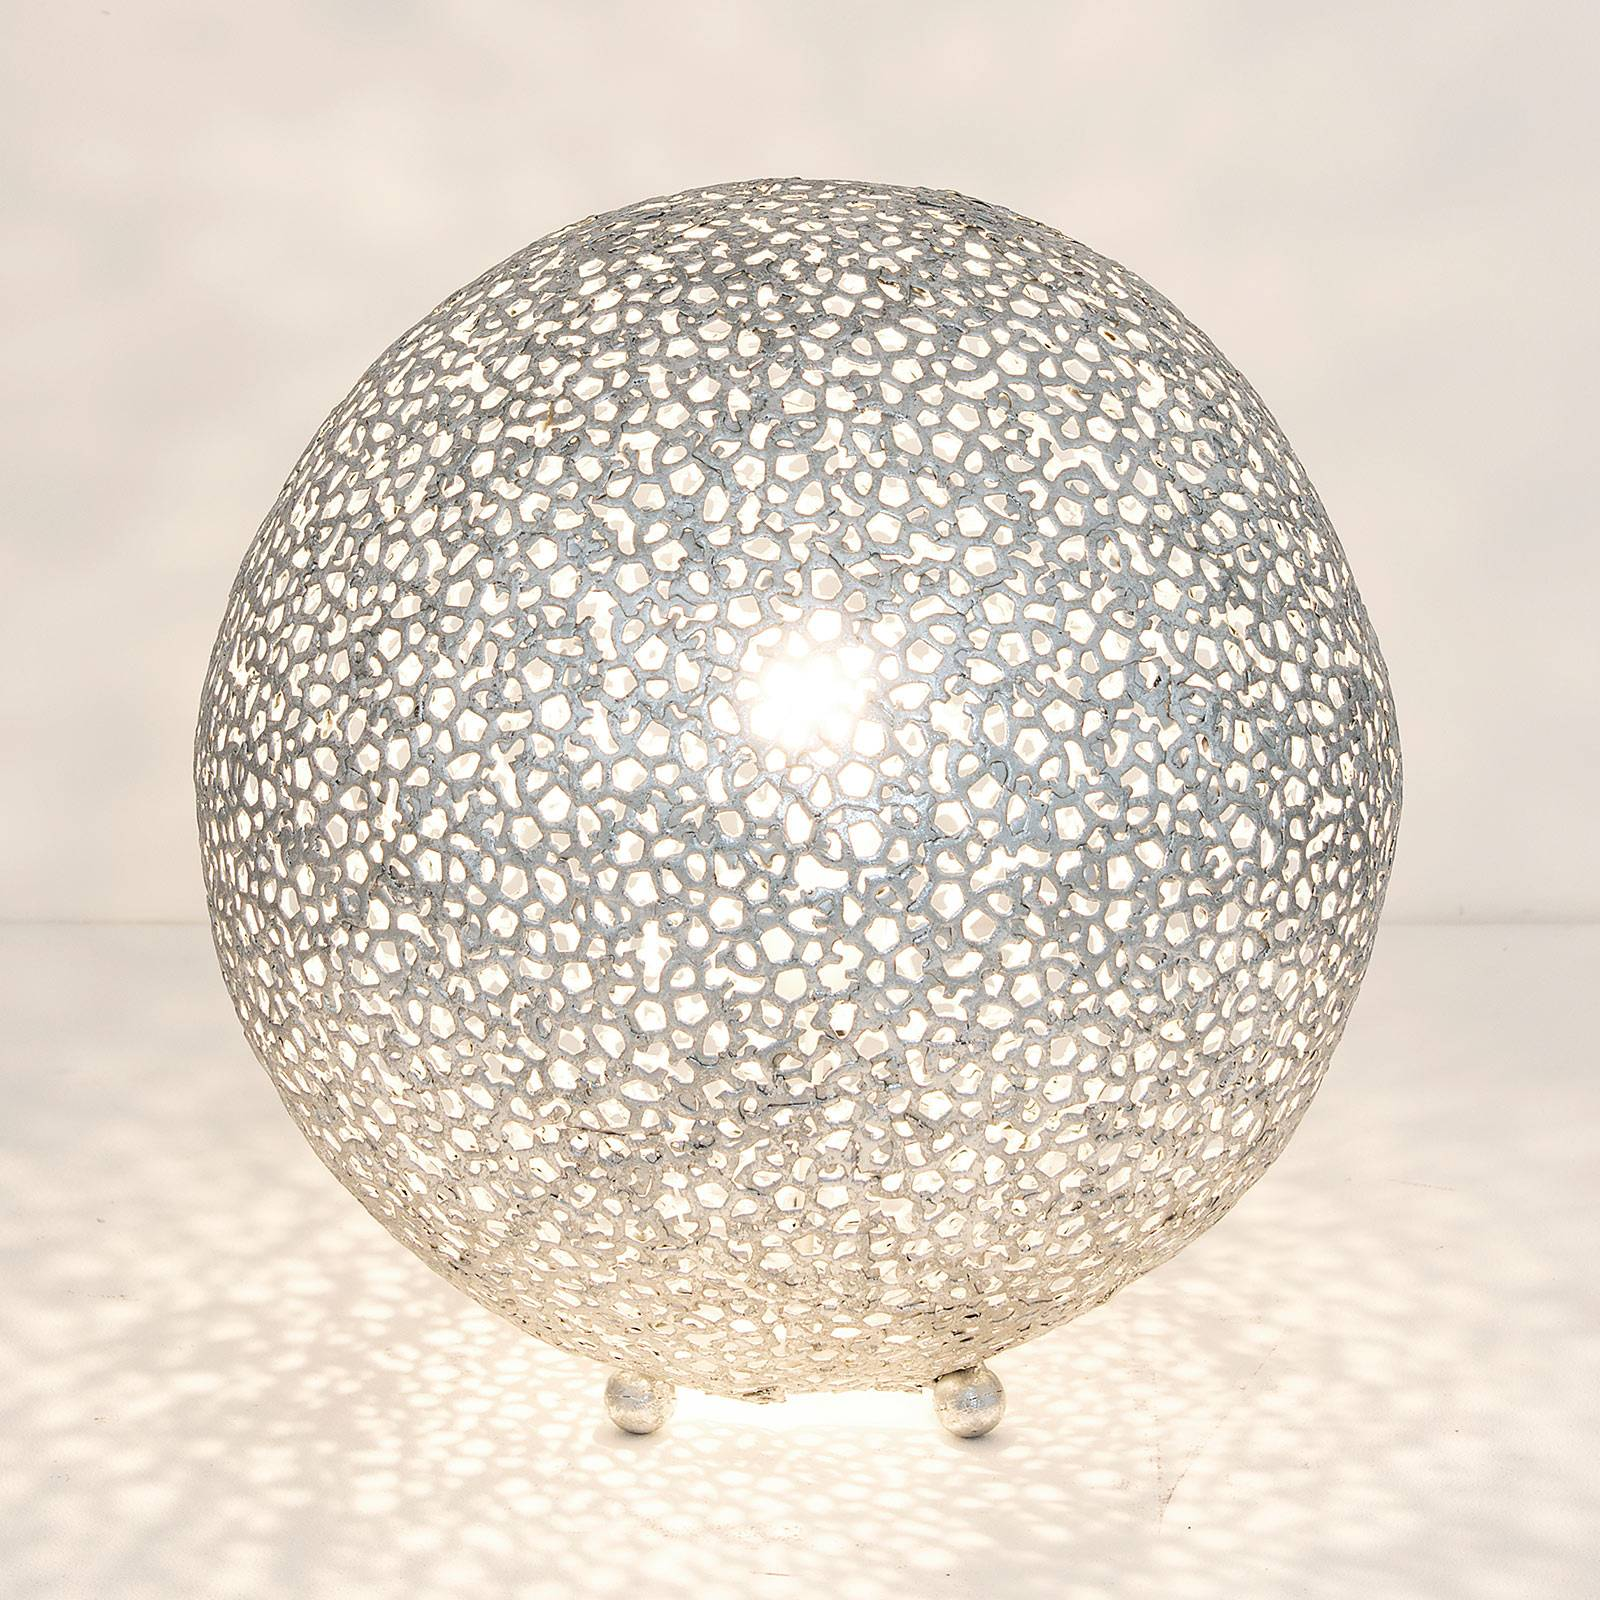 Pöytävalaisin Lily Grande, Ø 43 cm, hopea